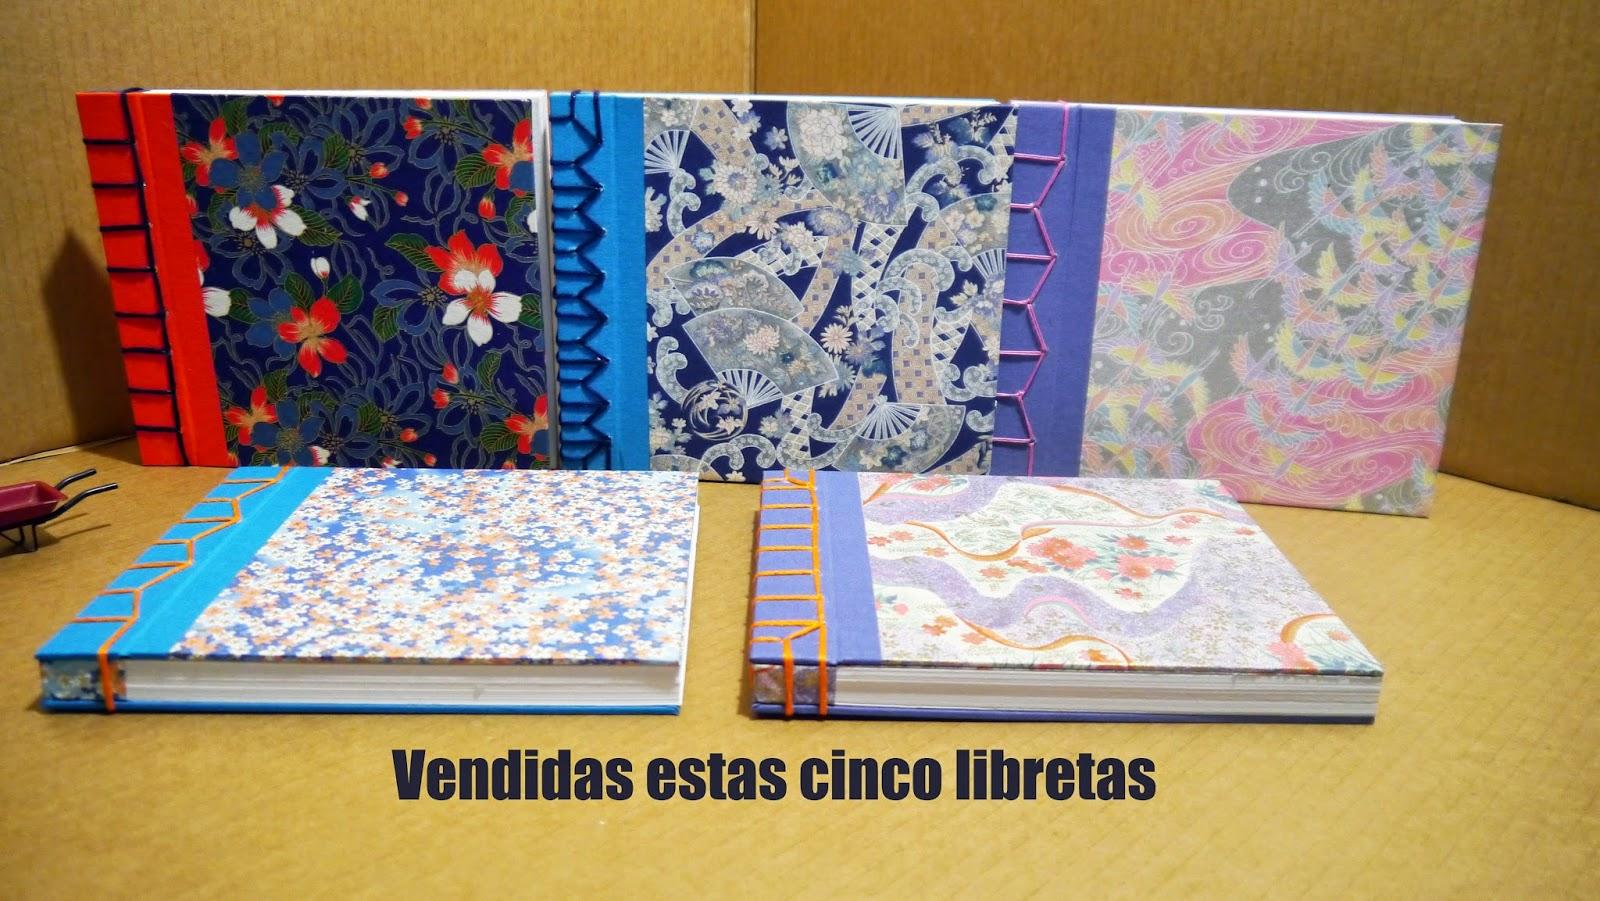 Libretas De Dibujo De Un Artista Freelance: Carretilla Roja: Libretas Para Dibujo O Caligrafía